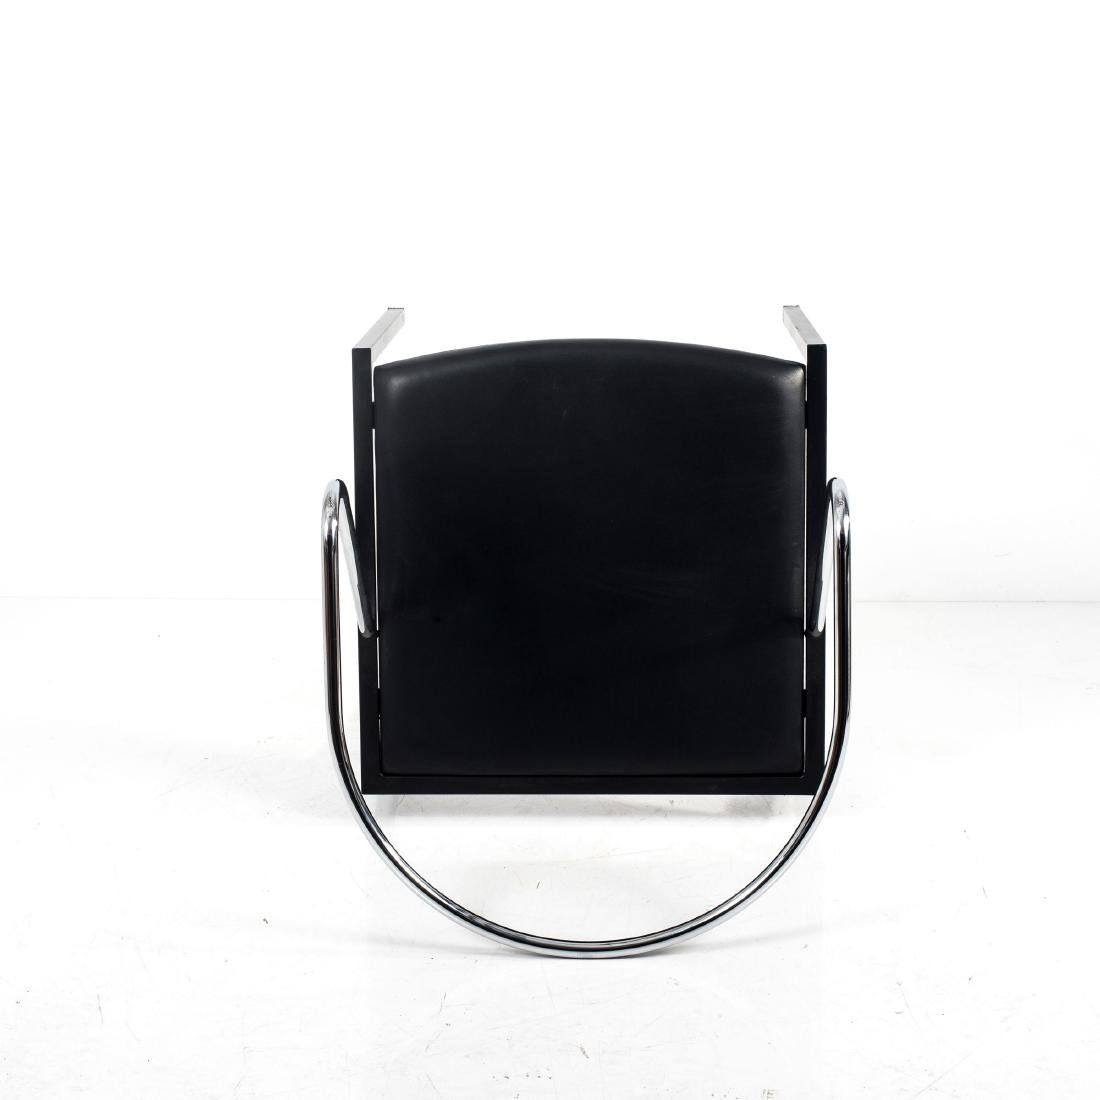 'Apple Honey chair', 1985 - 5